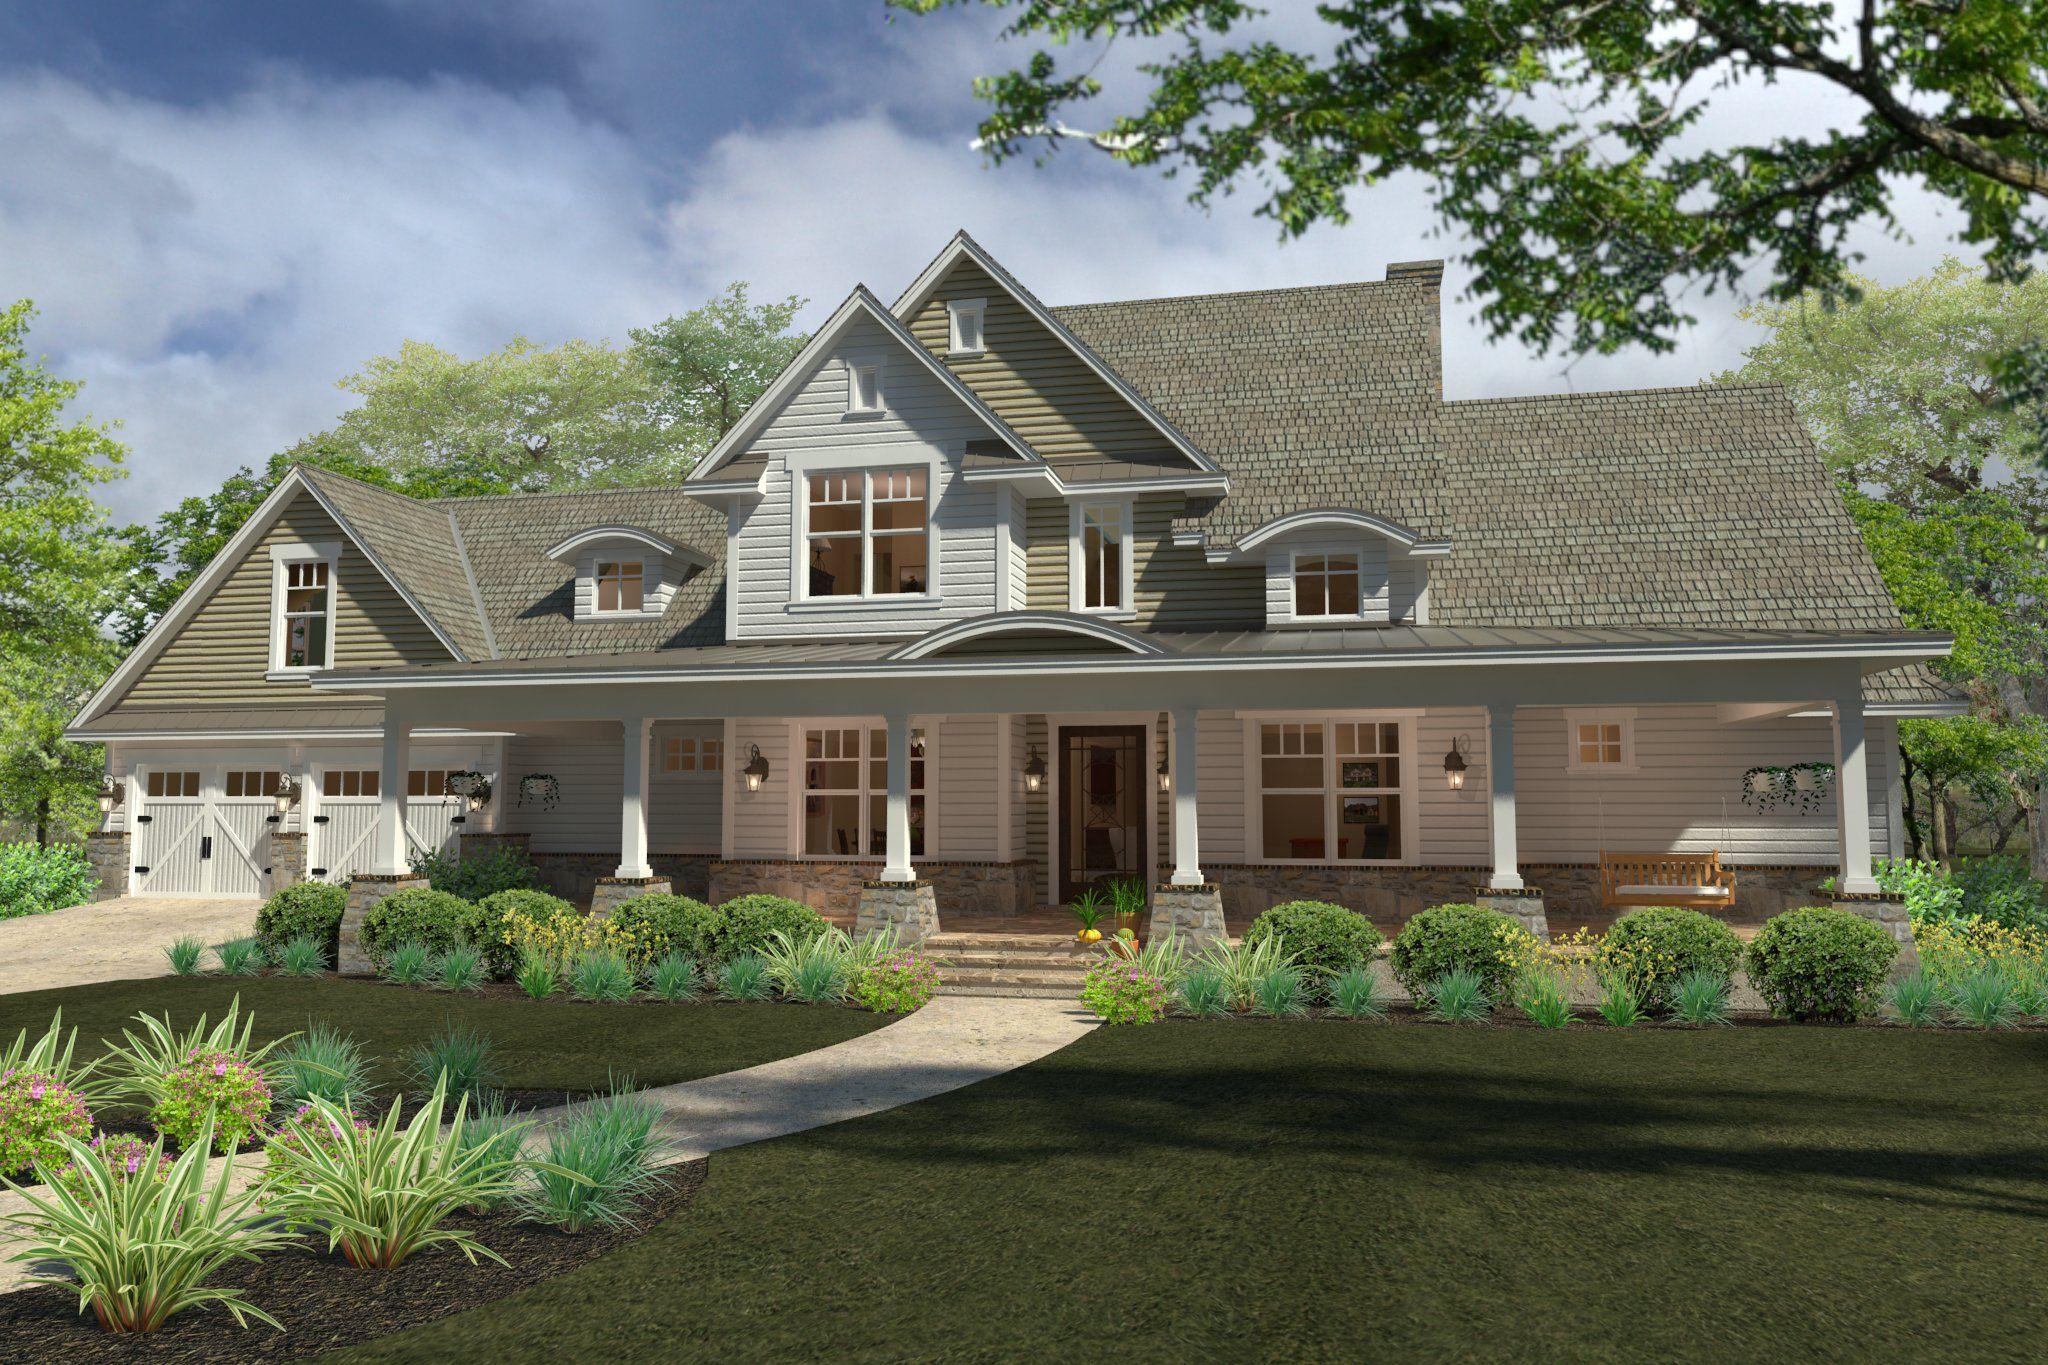 Modern house under 200k for Modern home designs under 200k